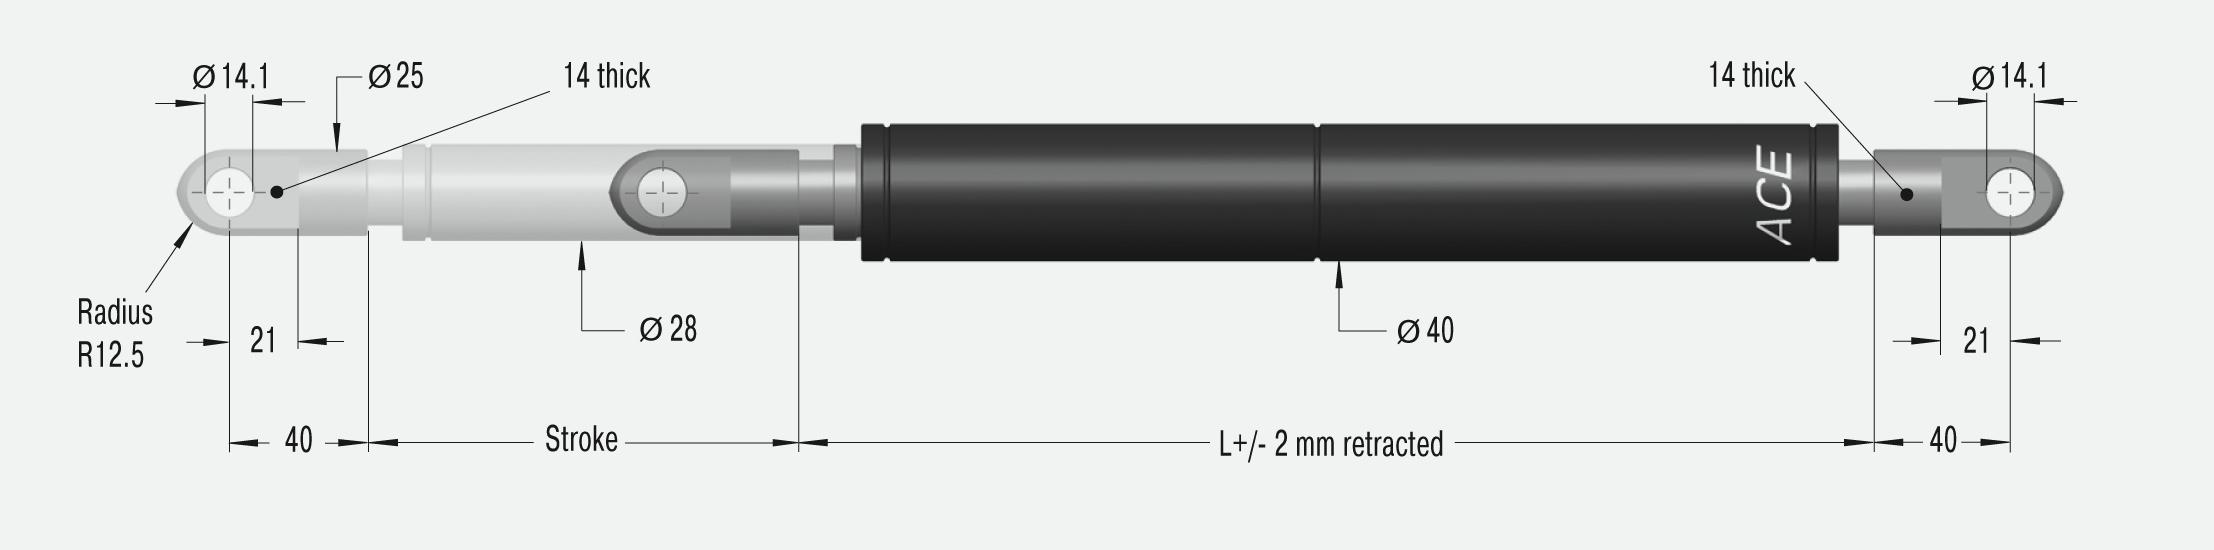 GZ-40-600